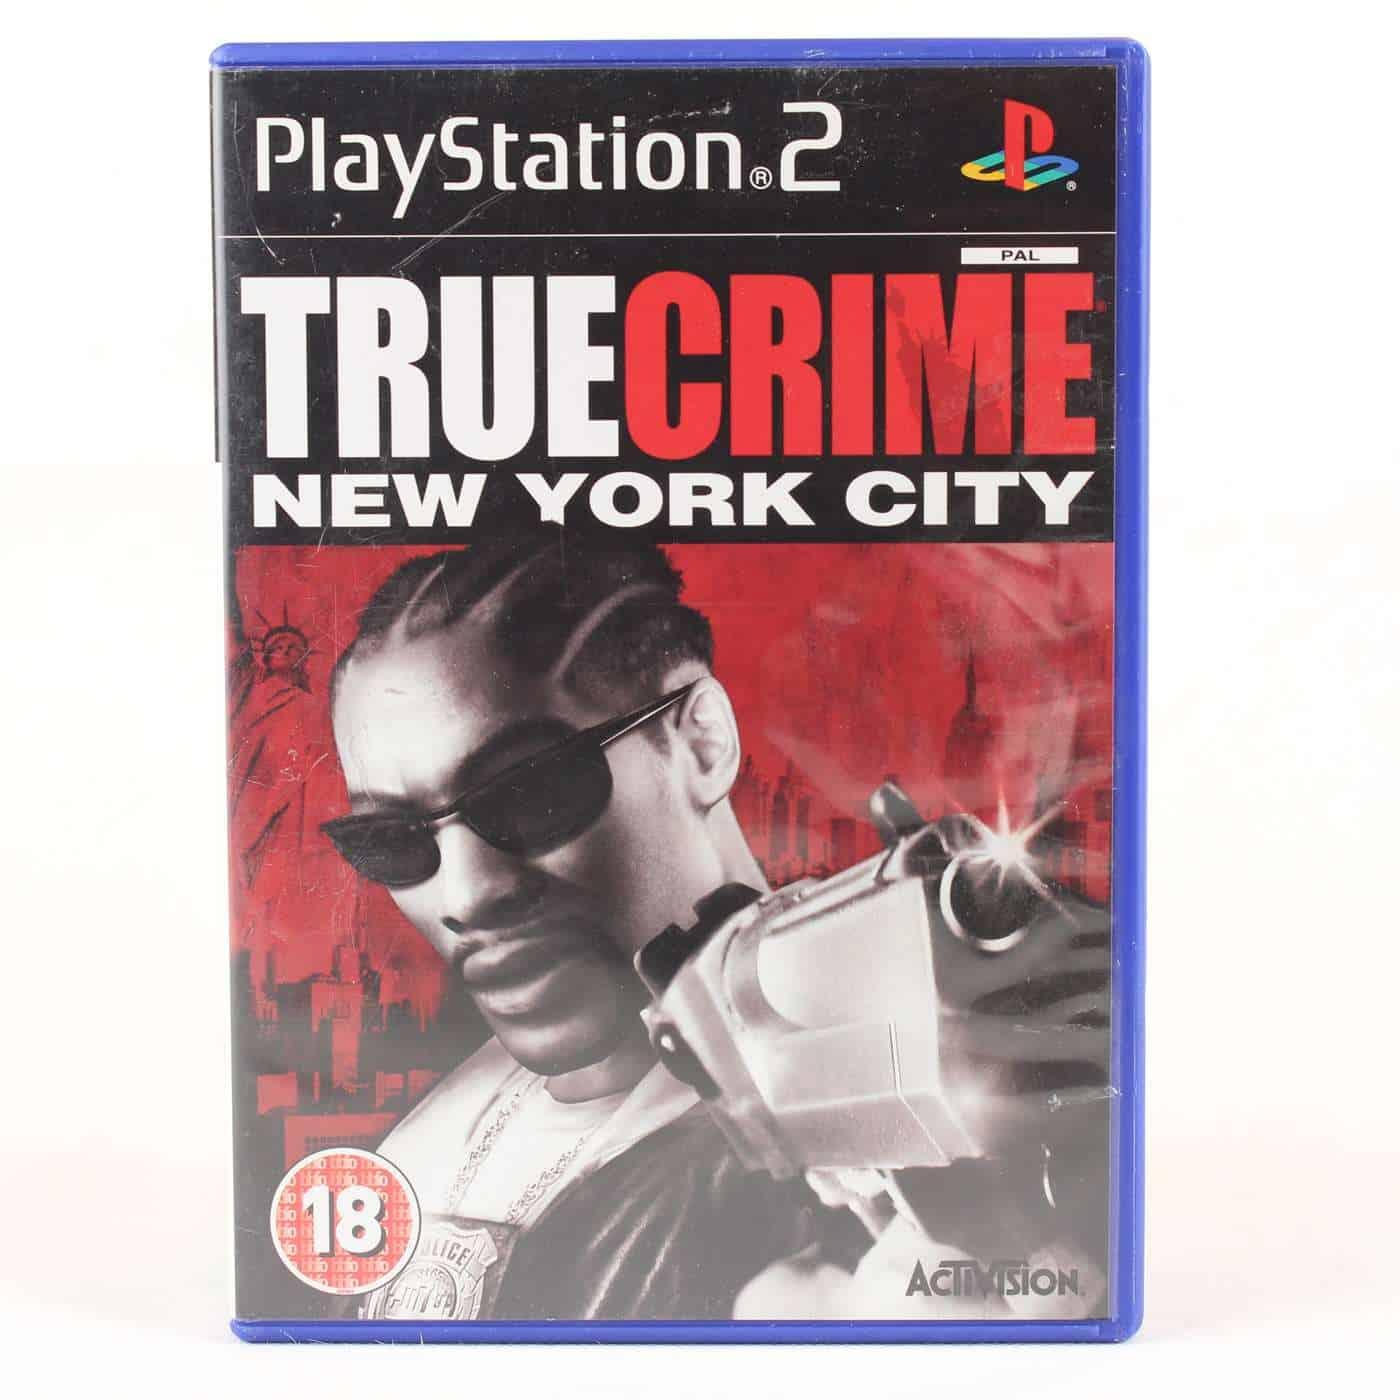 True Crime: New York City (Playstation 2)